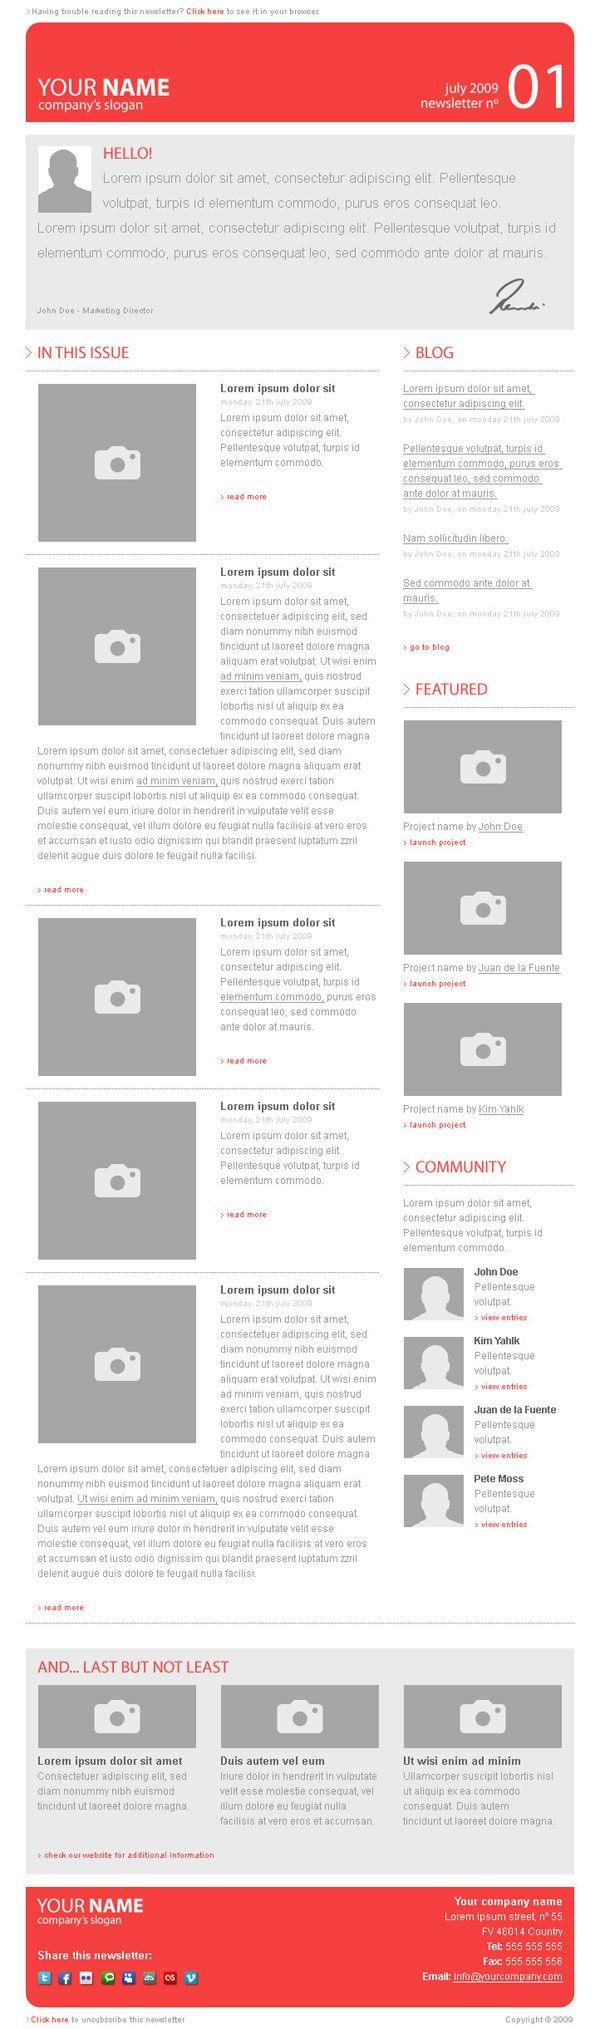 Inspiration & Ressources : 15 Newsletters originales - inspiration-ressources